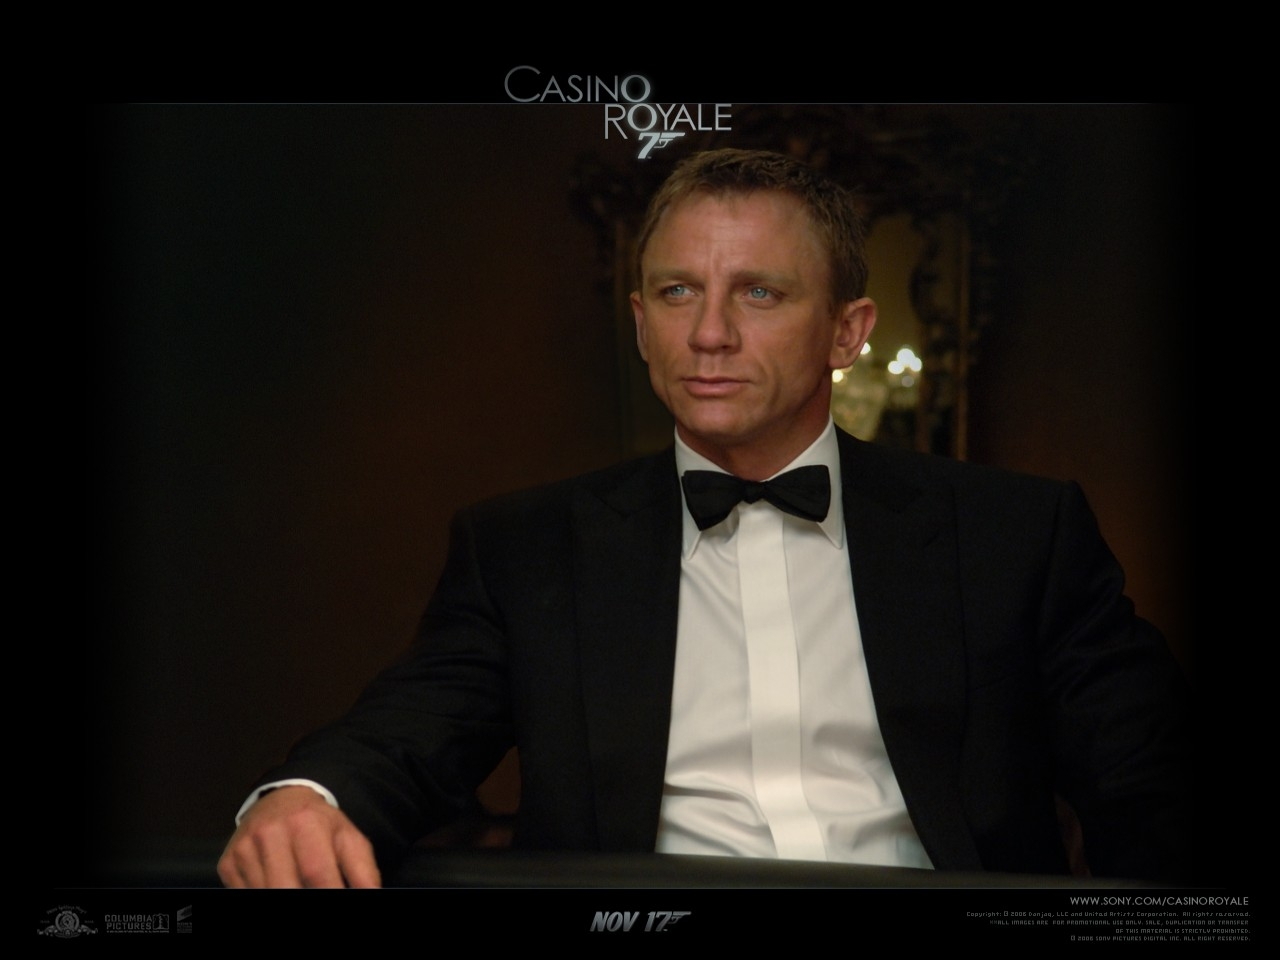 Wallpaper del film Casino Royale con Daniel Craig